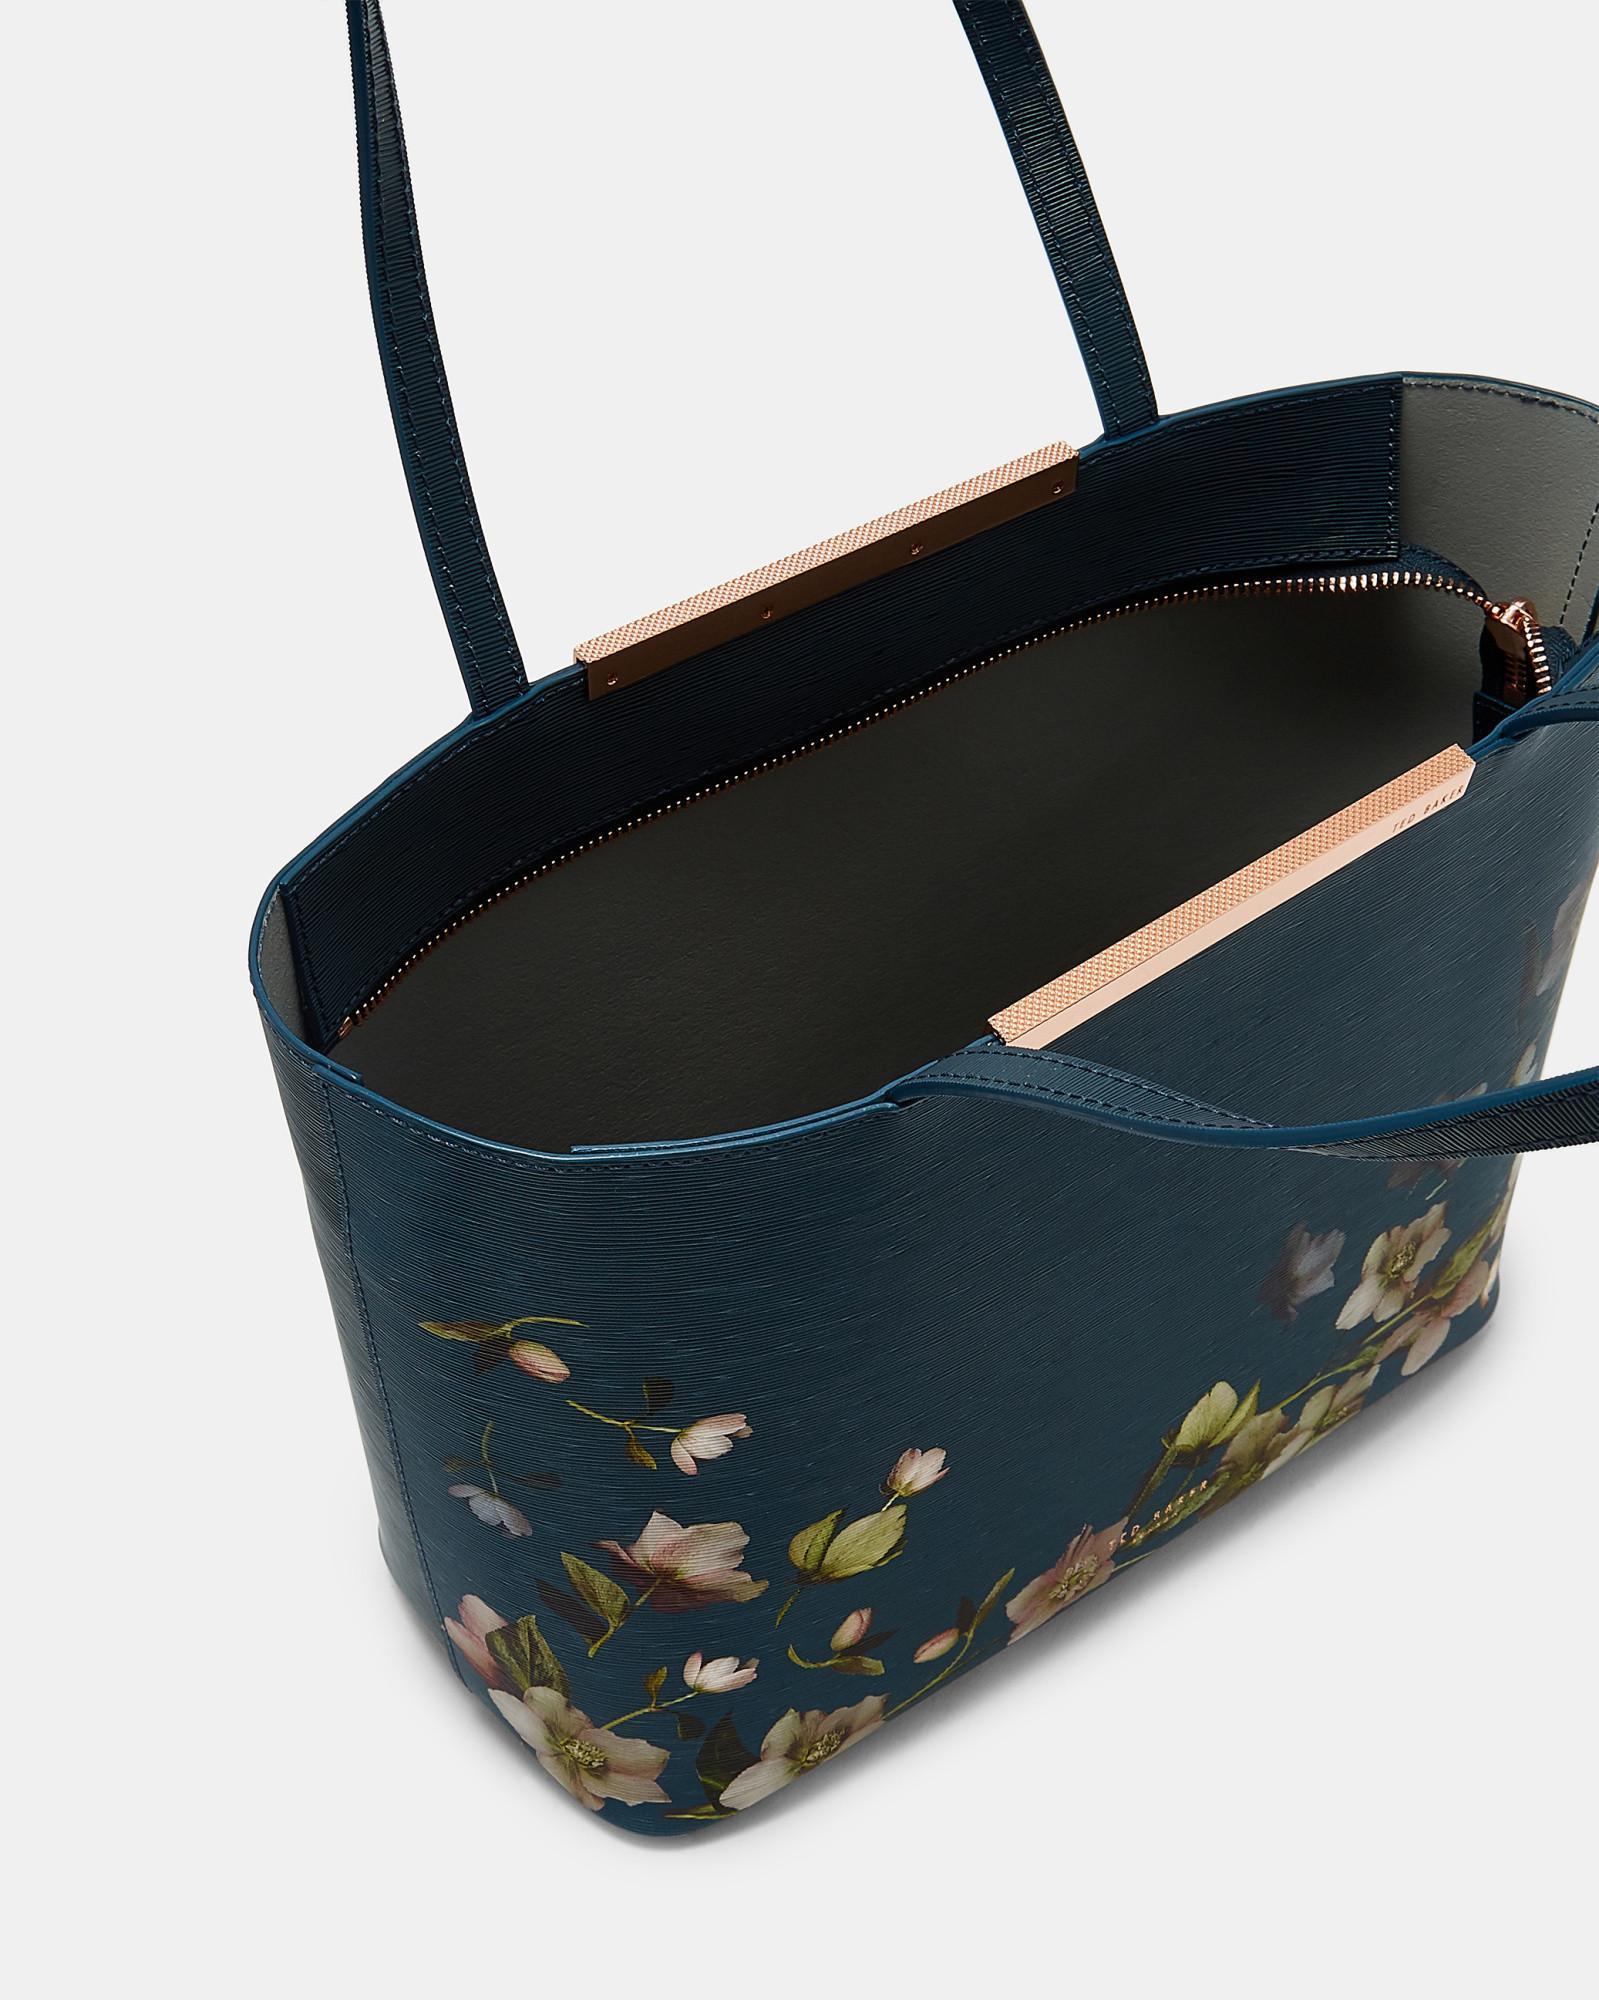 9a94c5b037c8 Lyst - Ted Baker Arboretum Mini Leather Shopper Bag in Blue